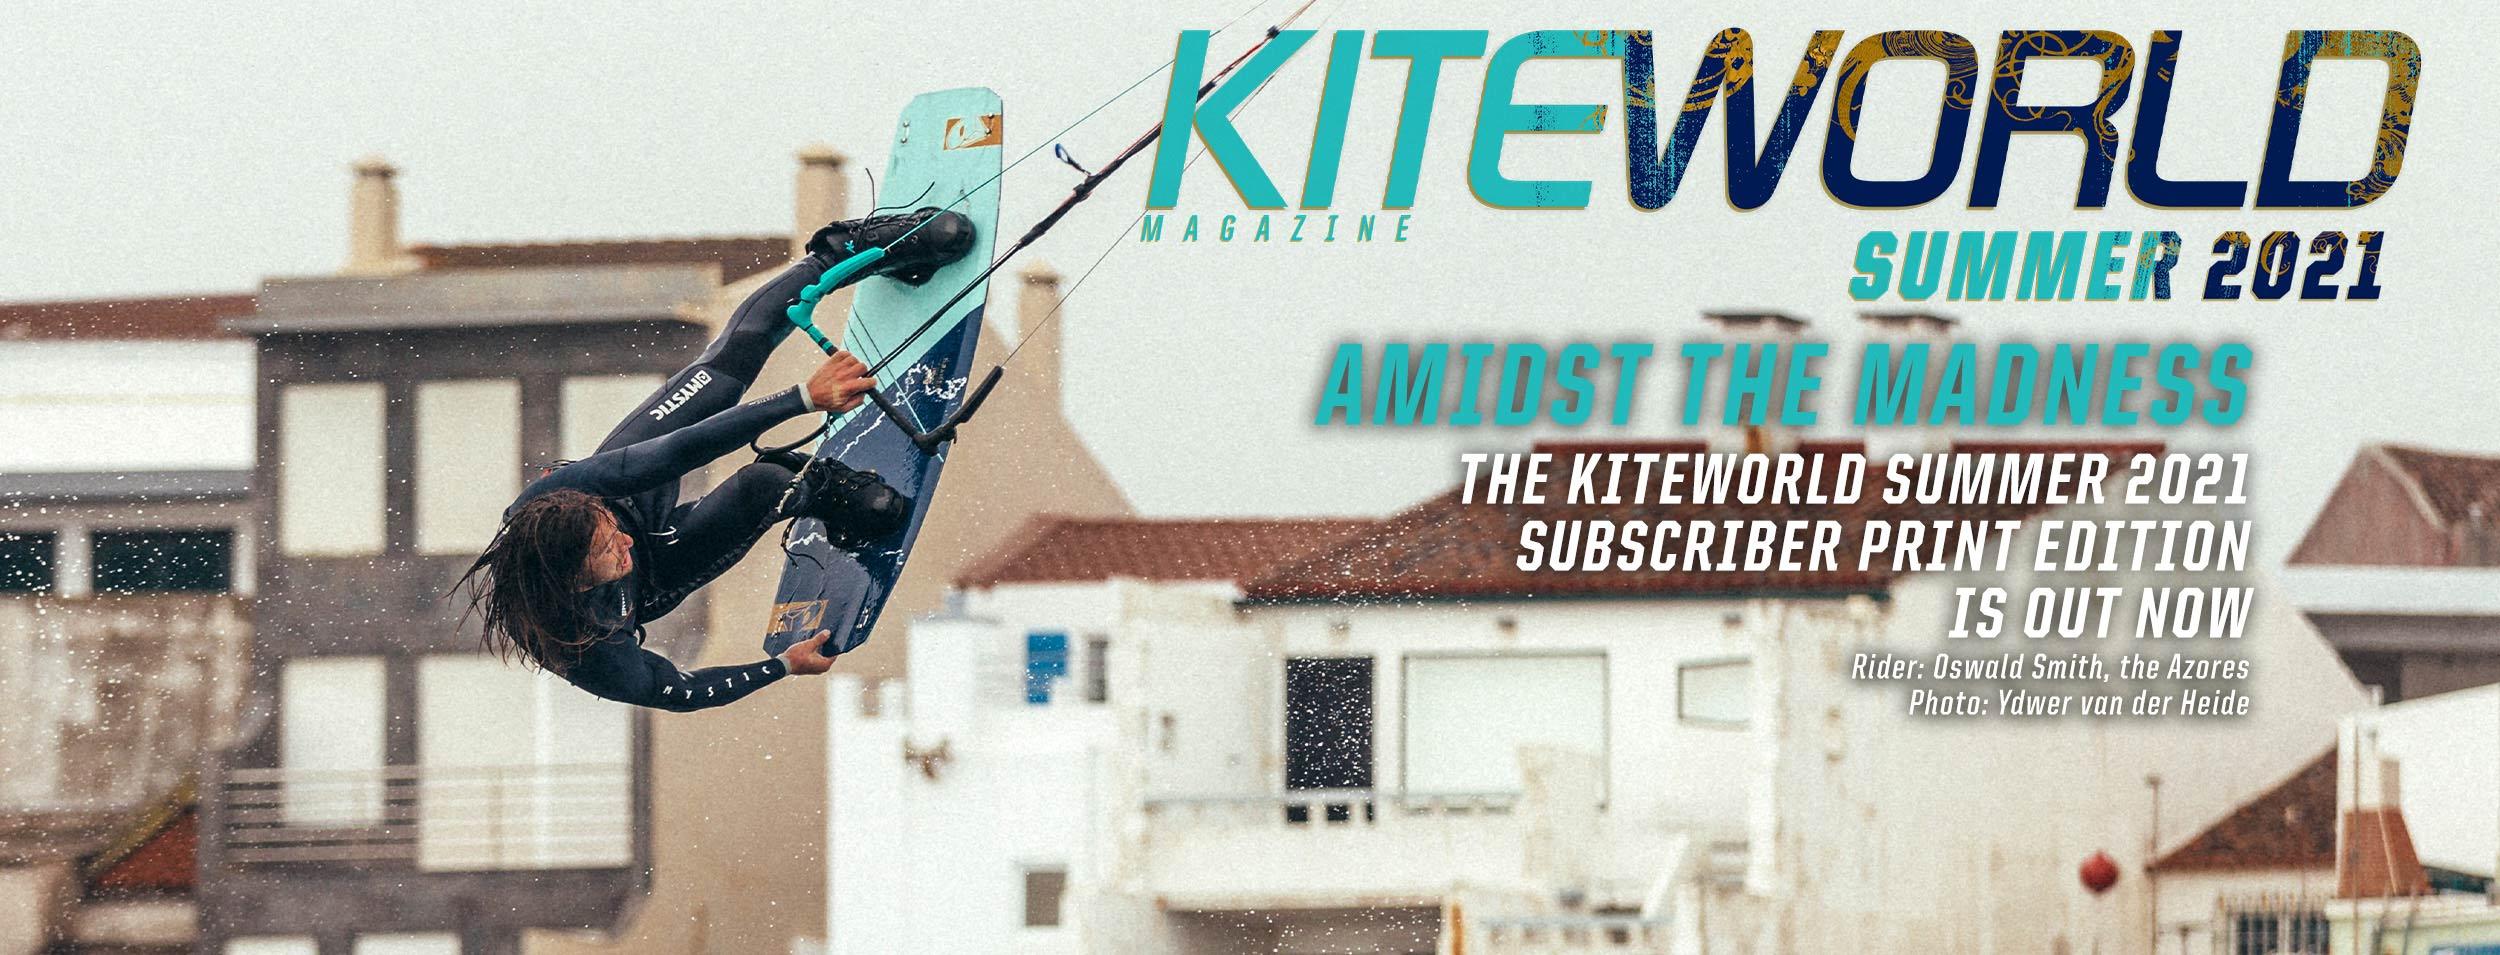 Kiteworld summer issue 2021